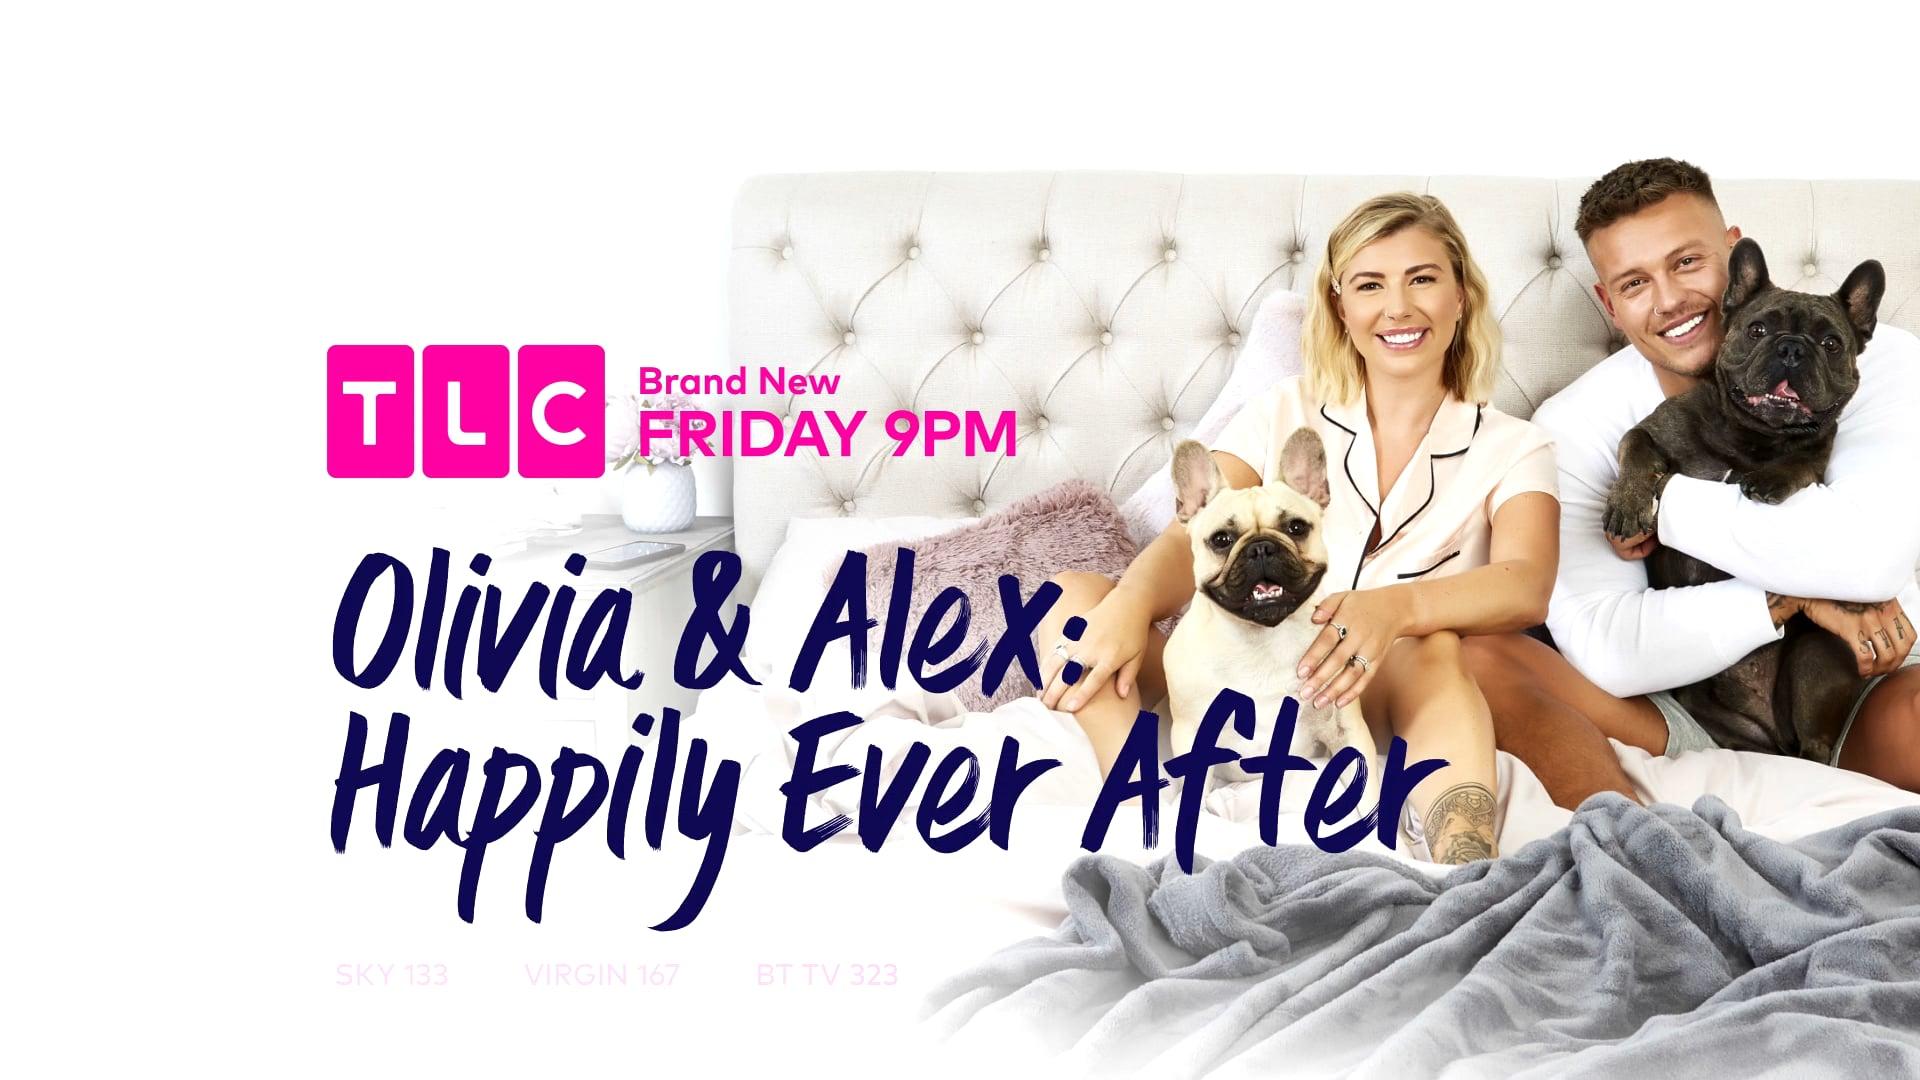 Olivia & Alex: Happily Ever After, TLC